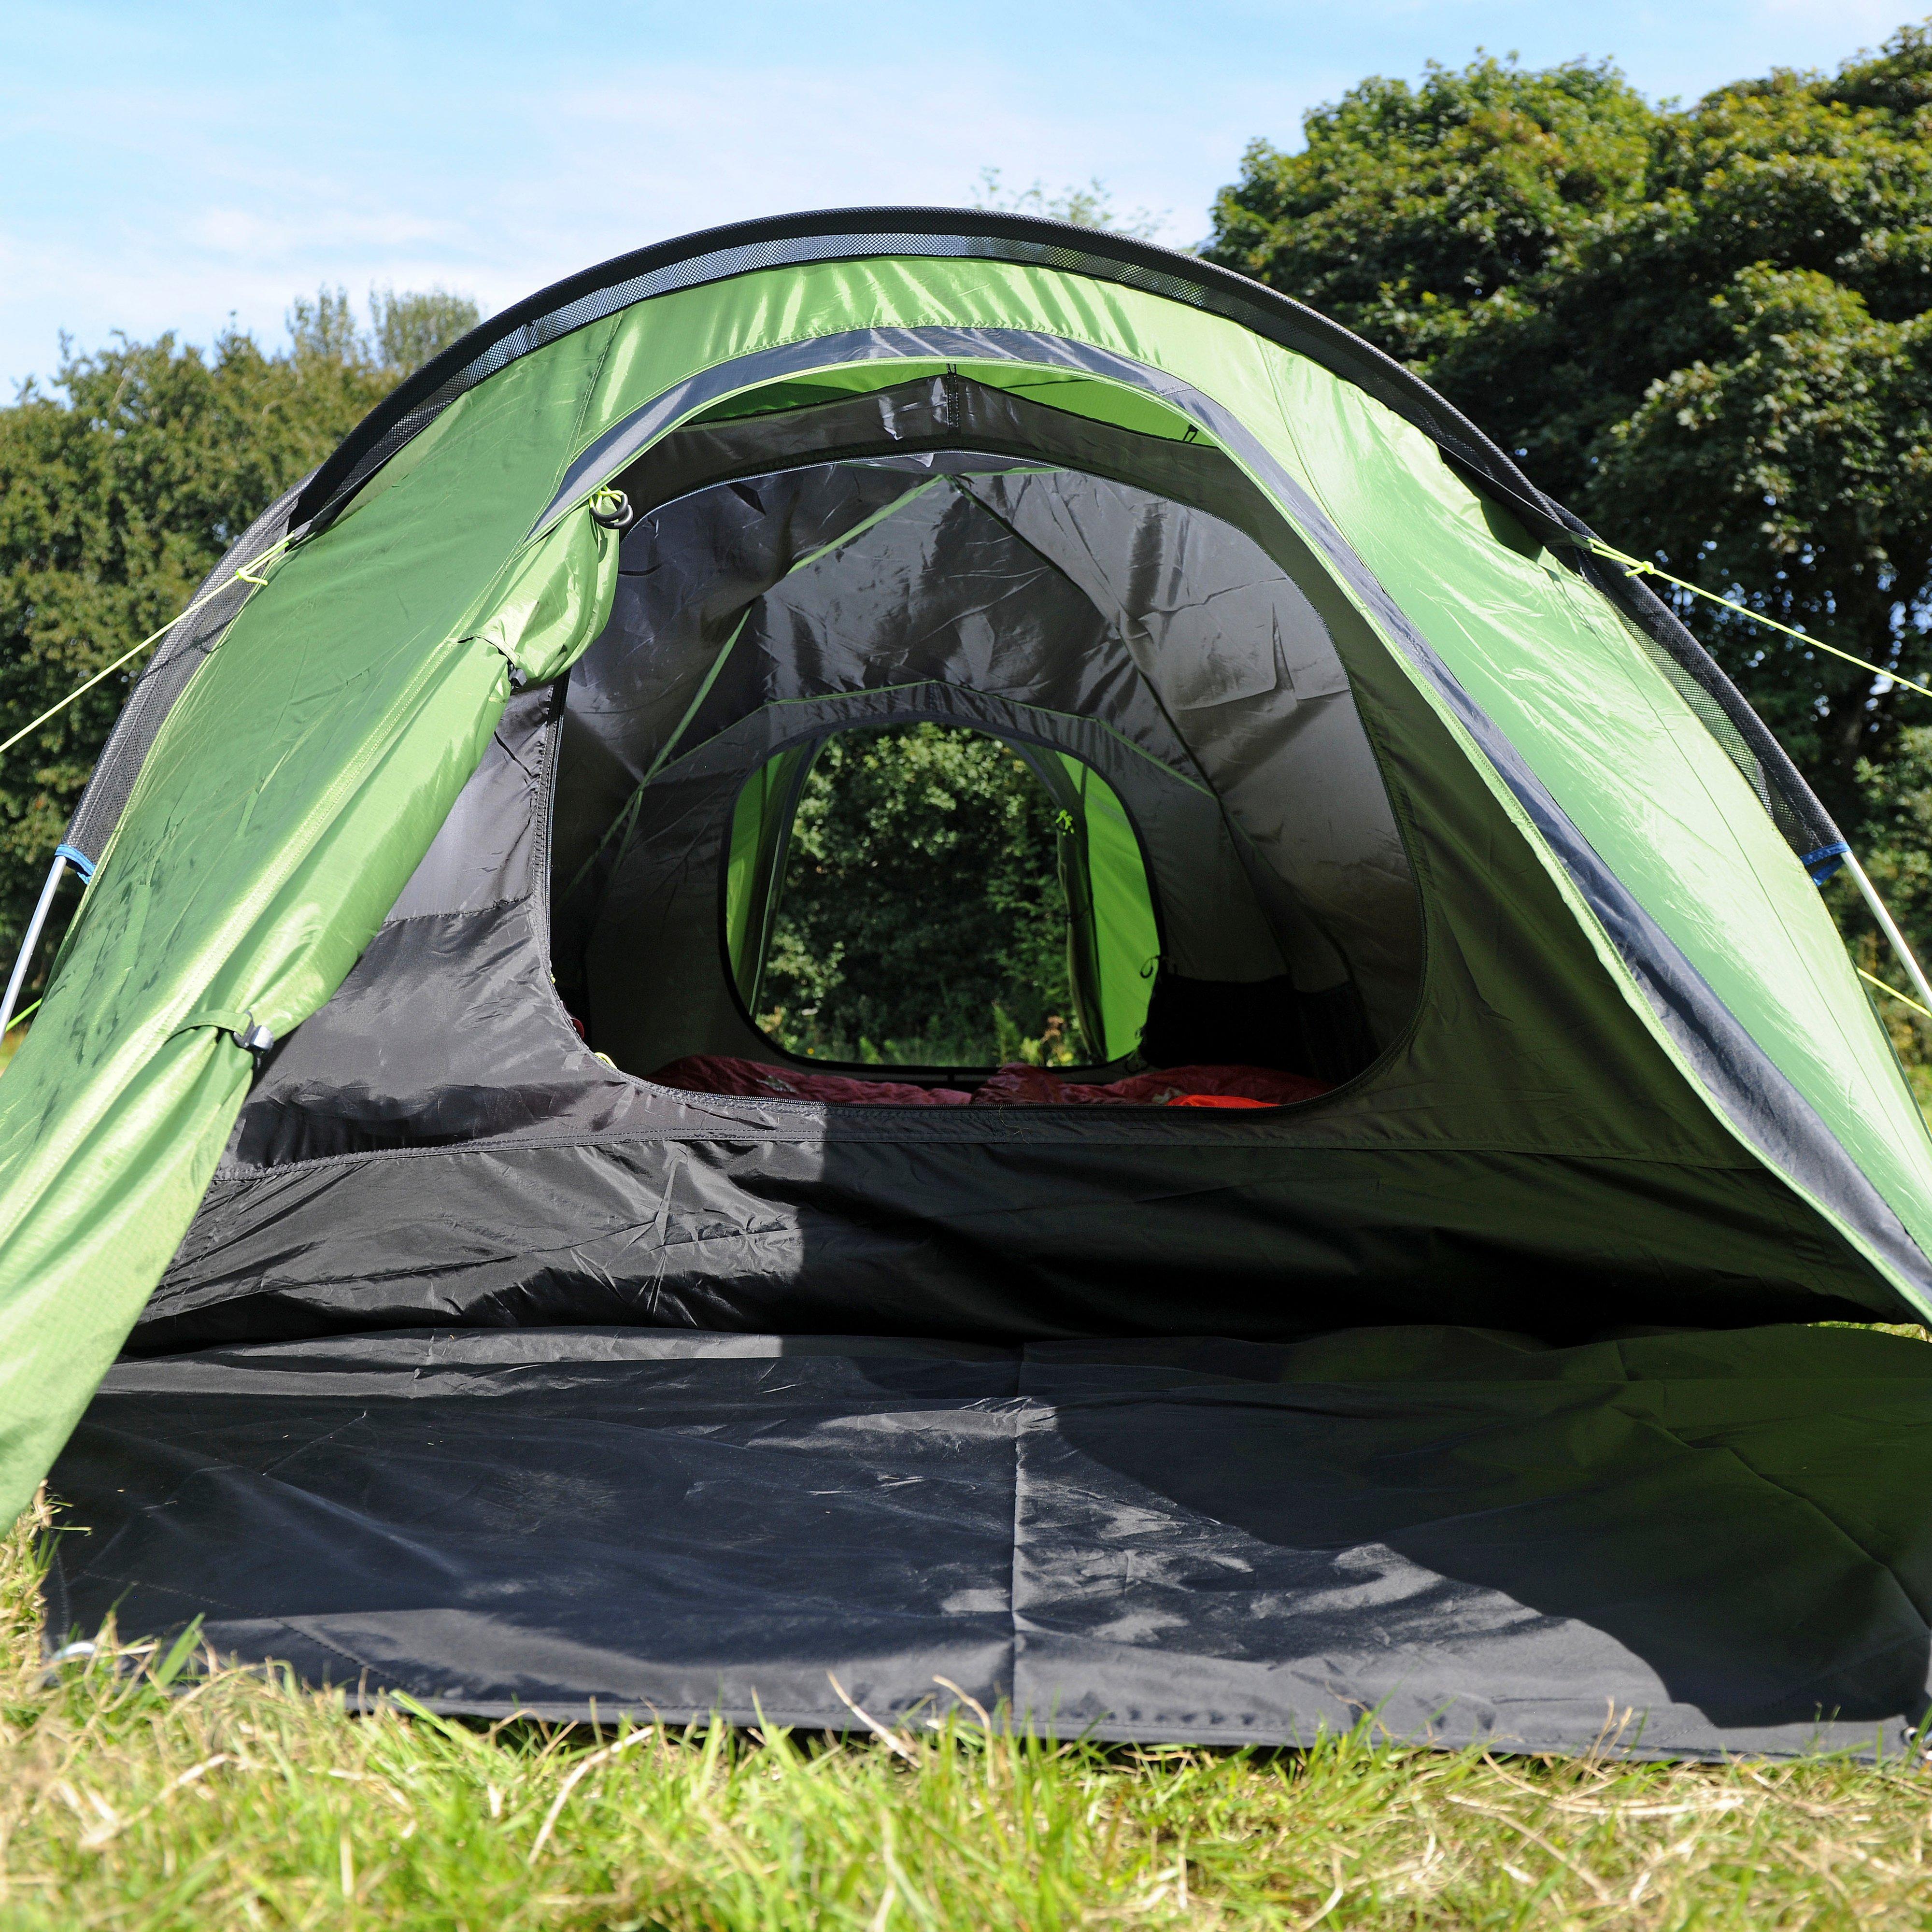 BERGHAUS Gr&ian 2 Man Tent & BERGHAUS Grampian 2 Man Tent | Millets